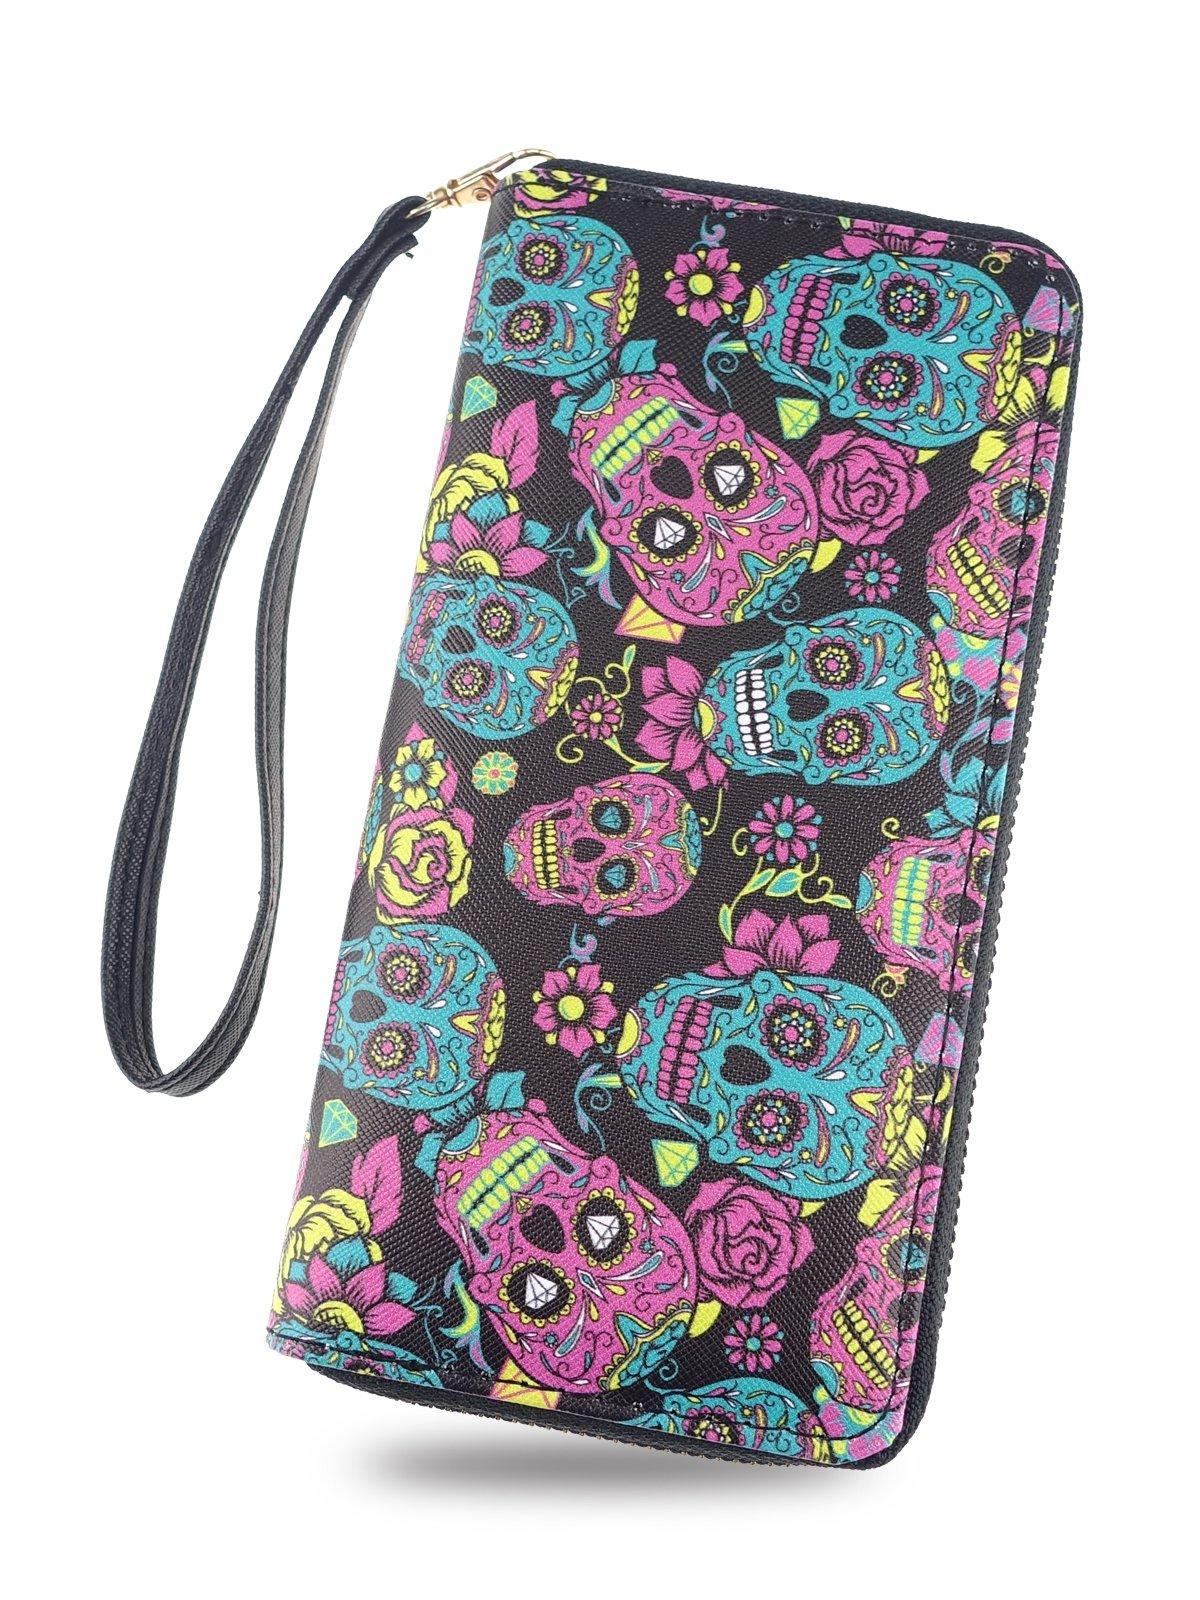 Women Long Zipper Wallet, Cartoon Style Purse Clutch Bag Card Holder for Teen Girls,Removable Wristlet Strap by YIPPLE